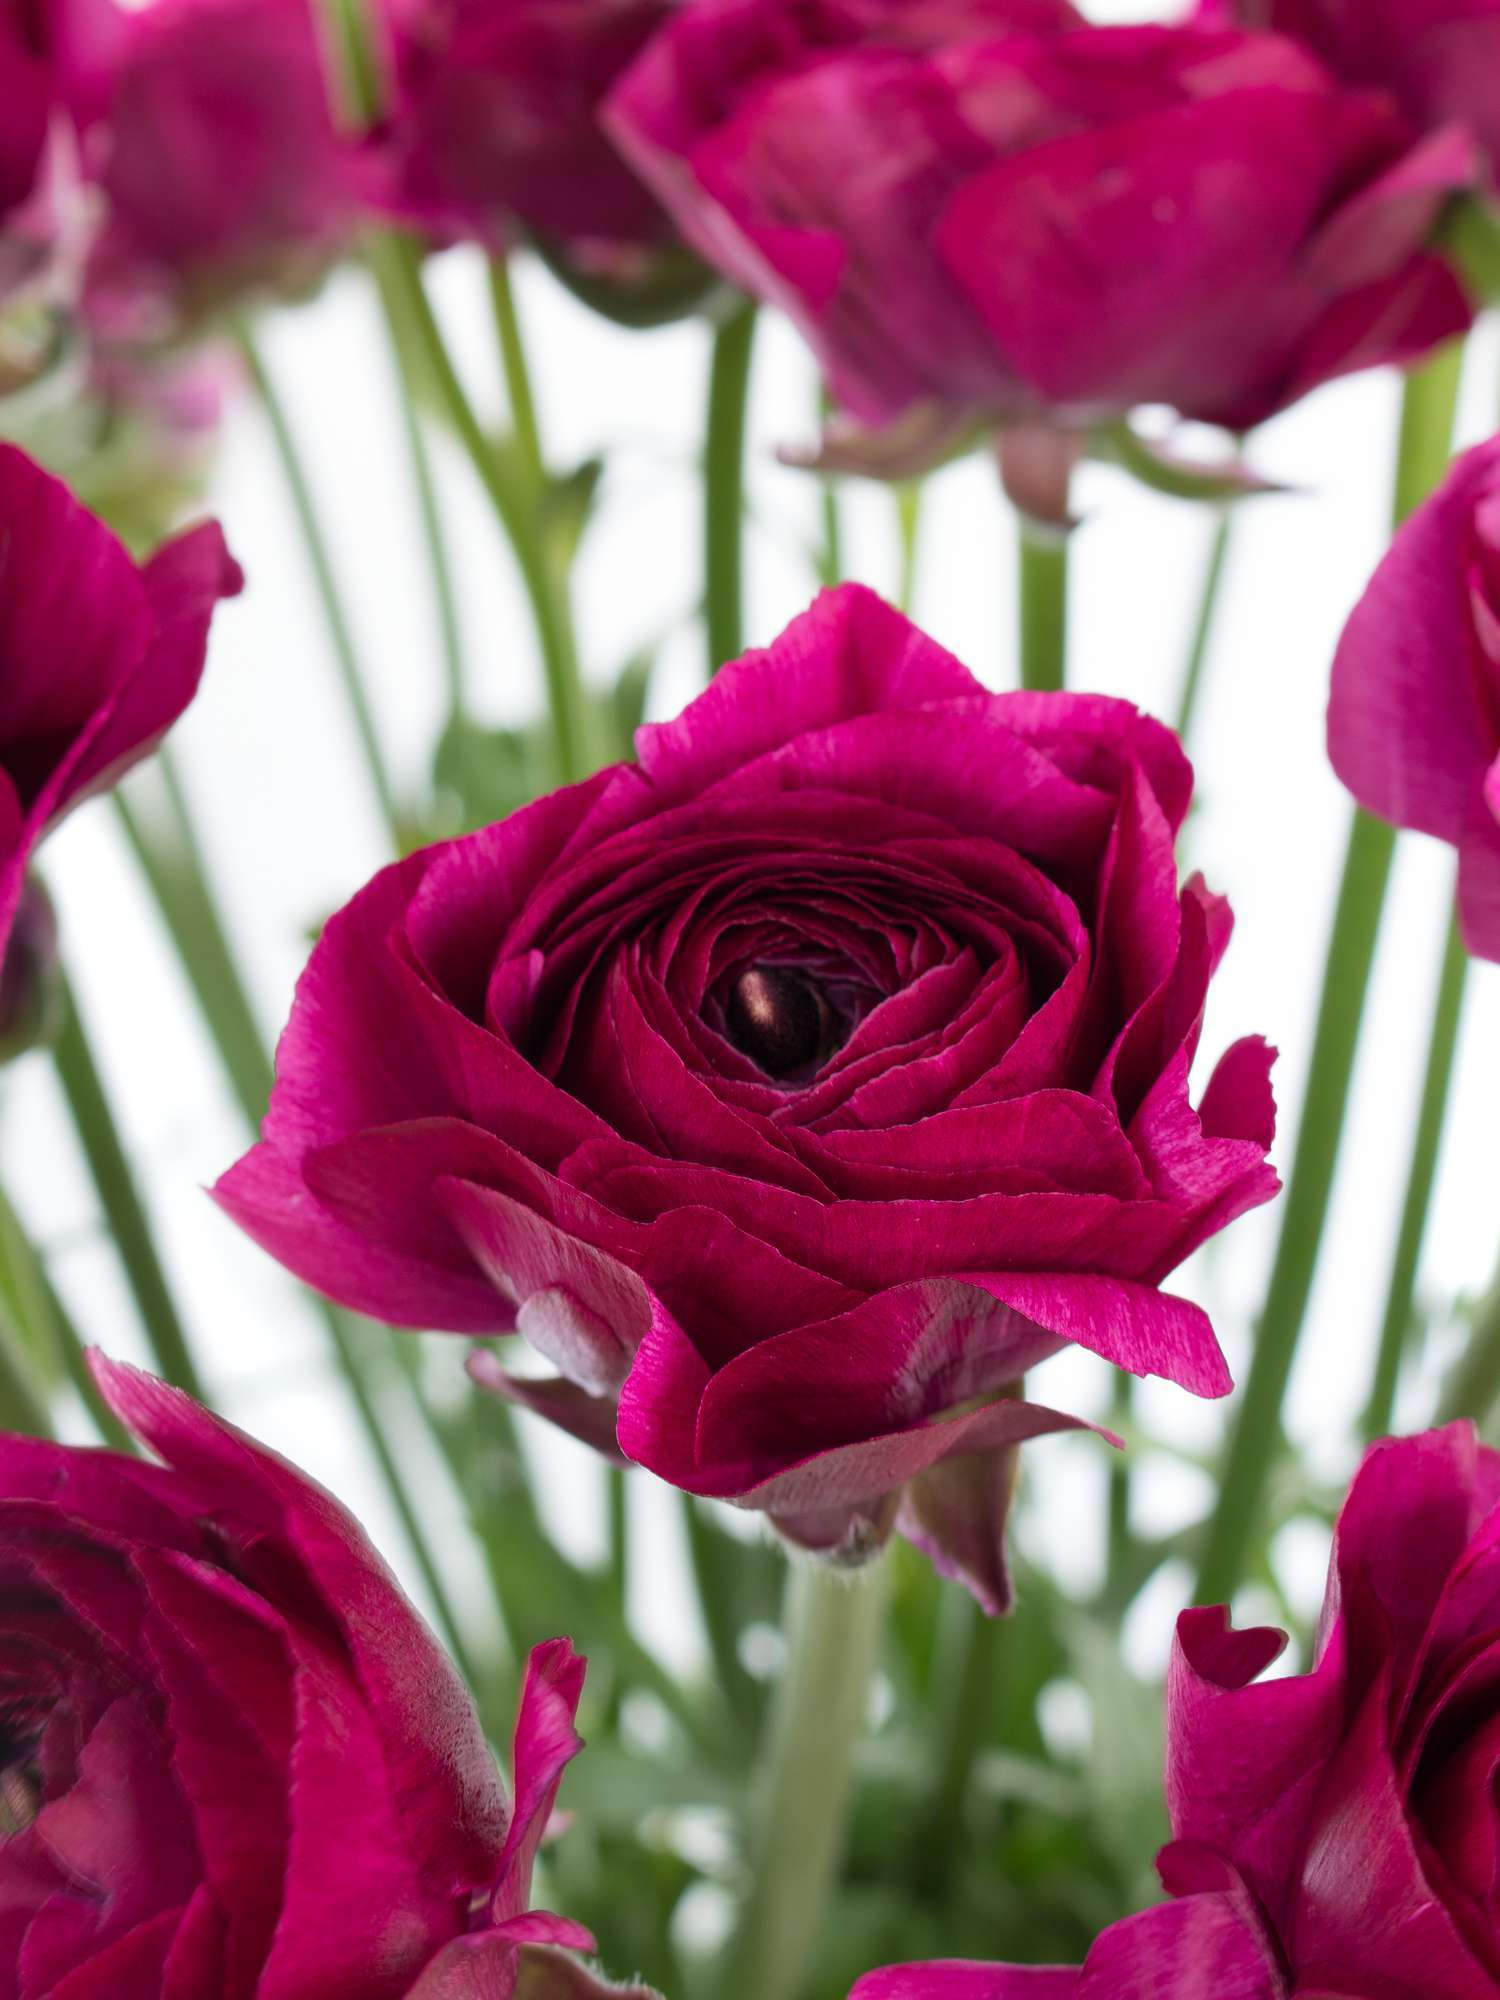 ranunkeln xl cloni cherry violett bestellen blumigo. Black Bedroom Furniture Sets. Home Design Ideas